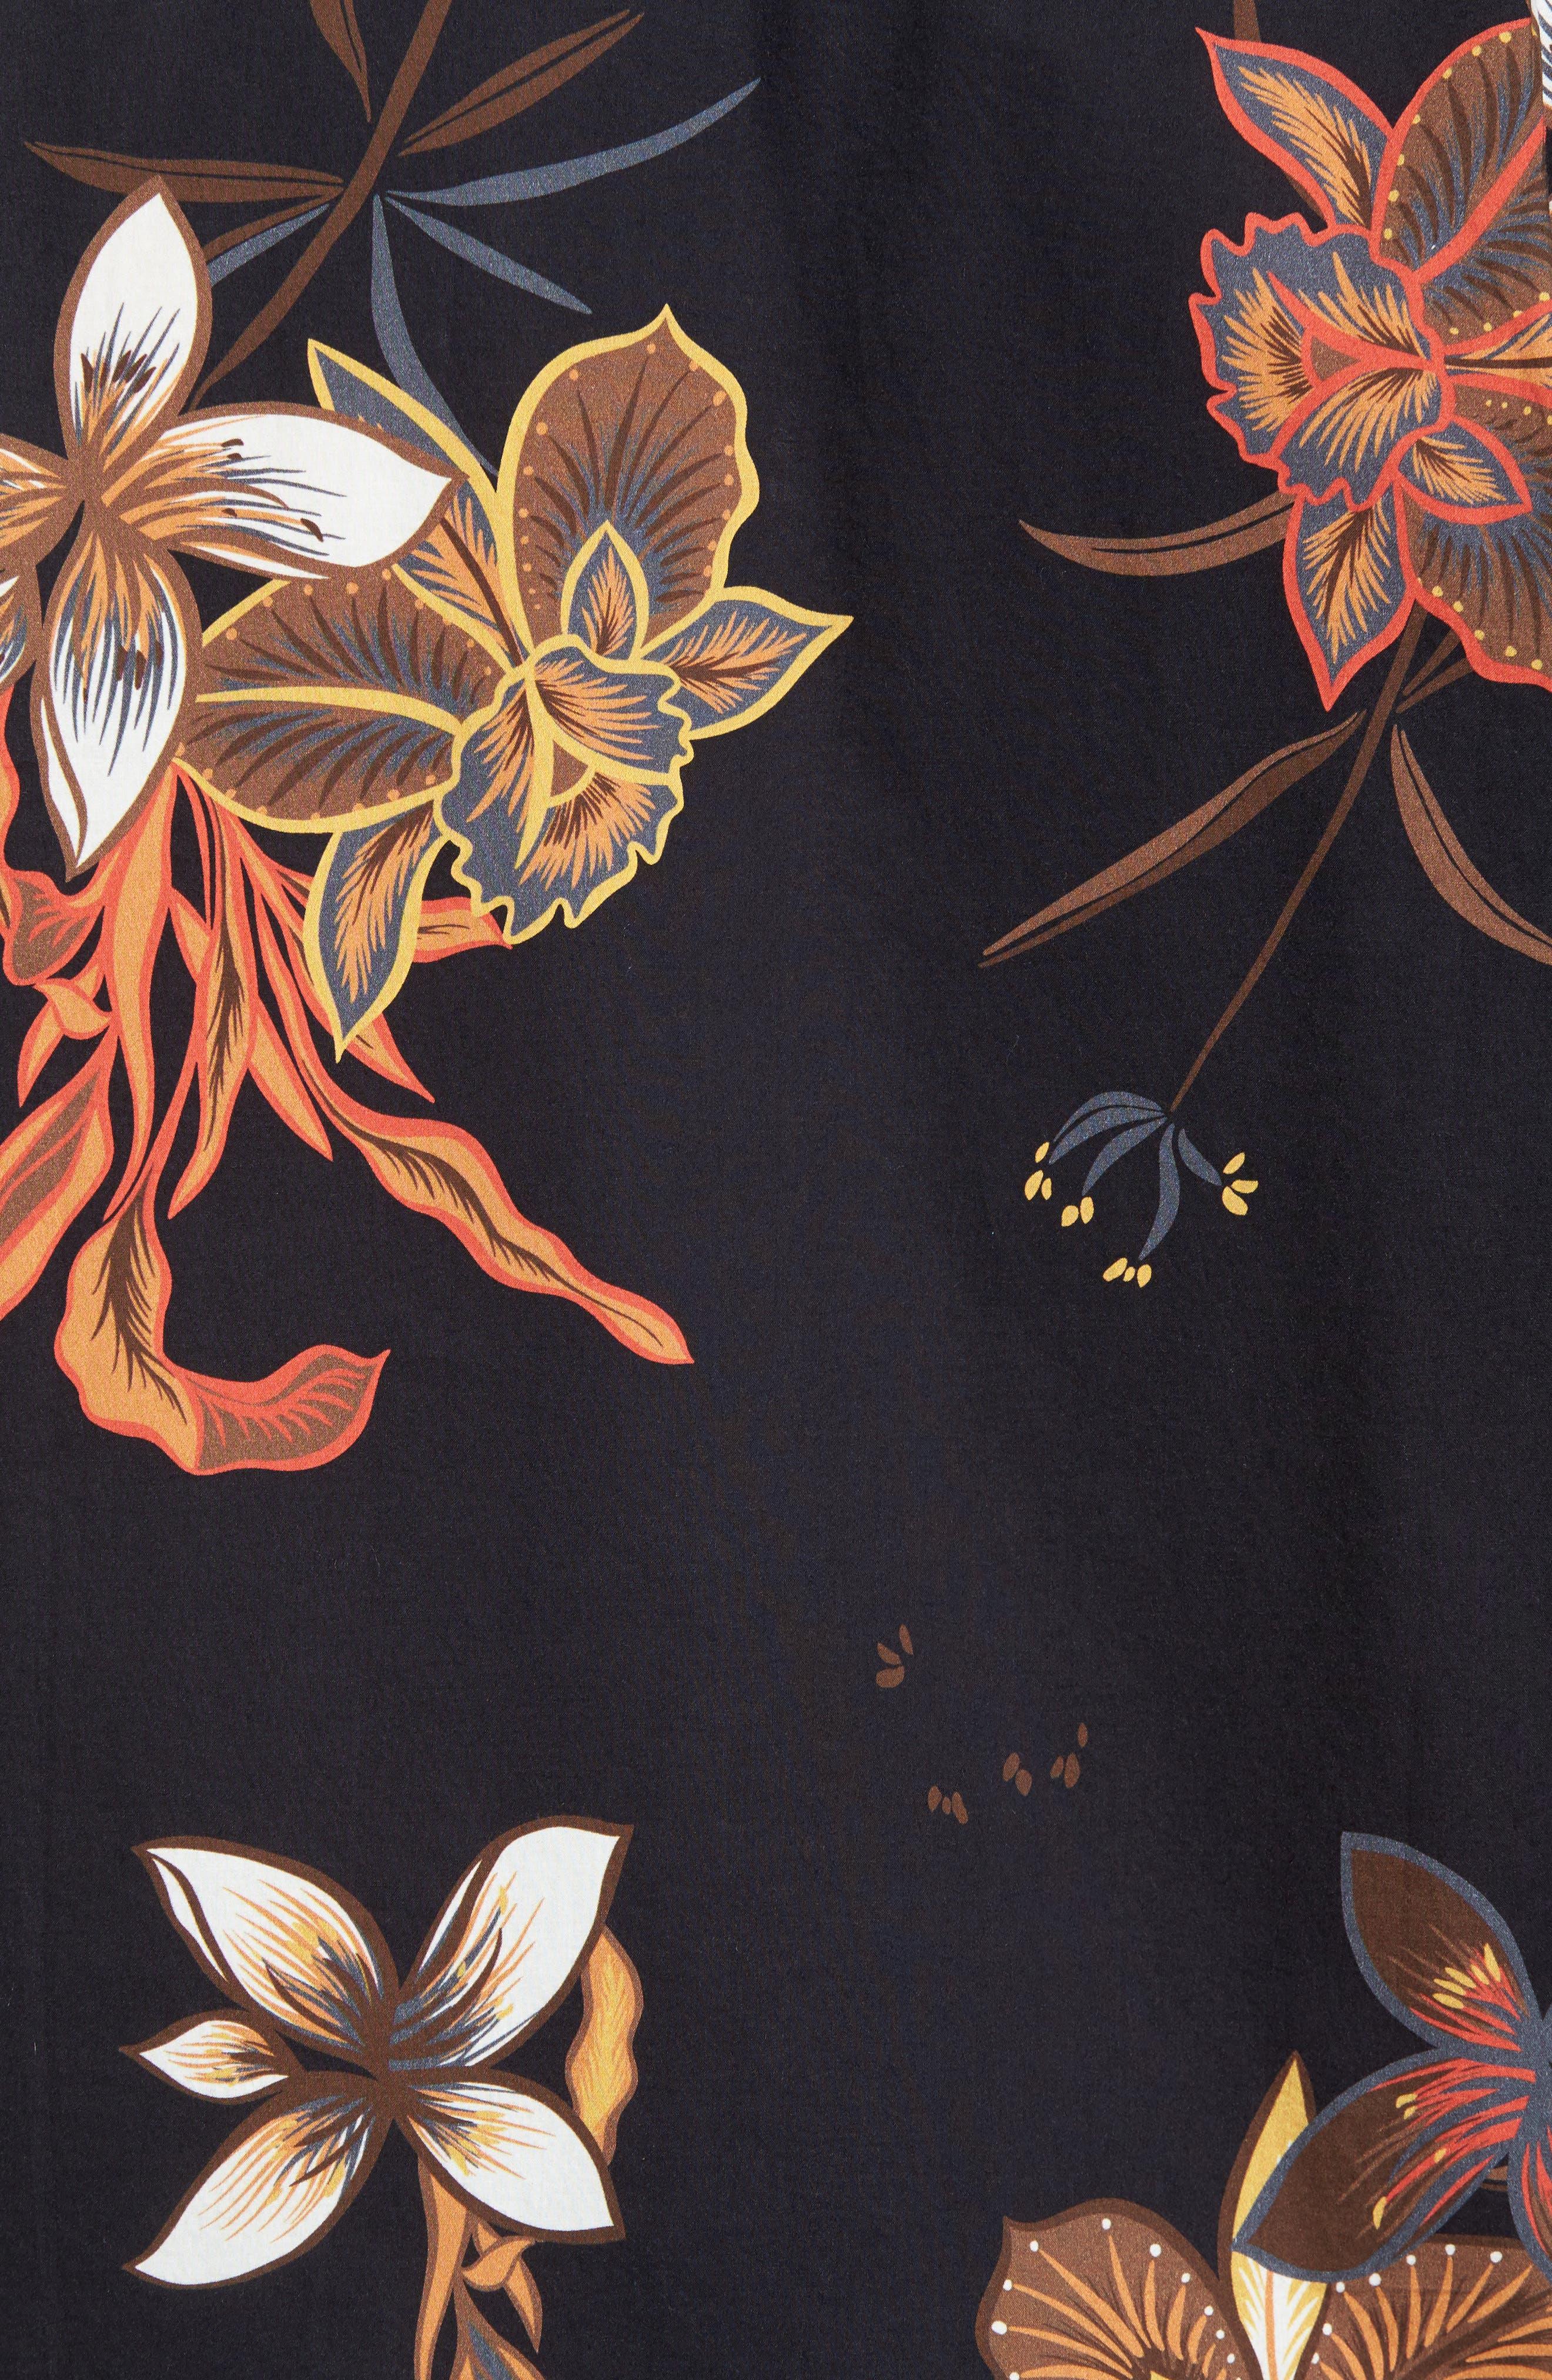 Sunday Floral Woven Shirt,                             Alternate thumbnail 5, color,                             001